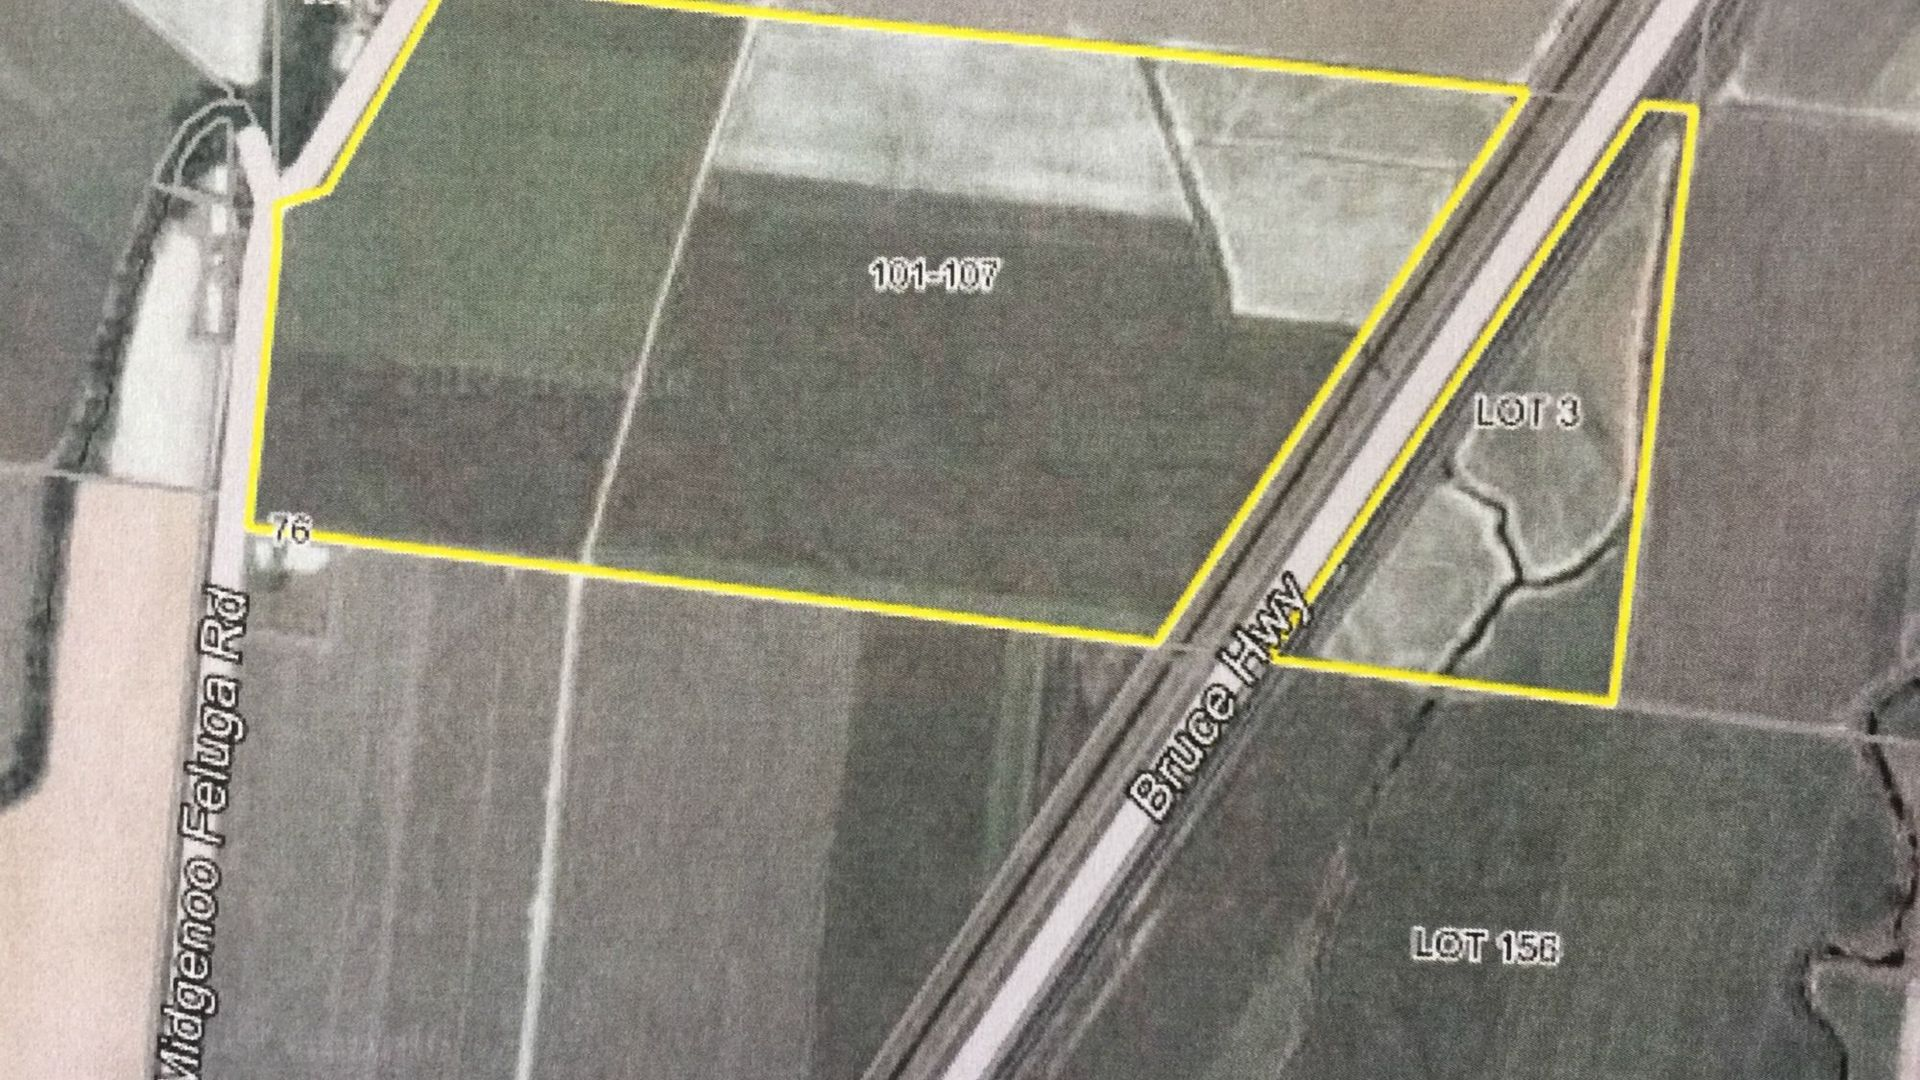 101 - 107 Midgenoo Feluga Rd, Feluga QLD 4854, Image 1